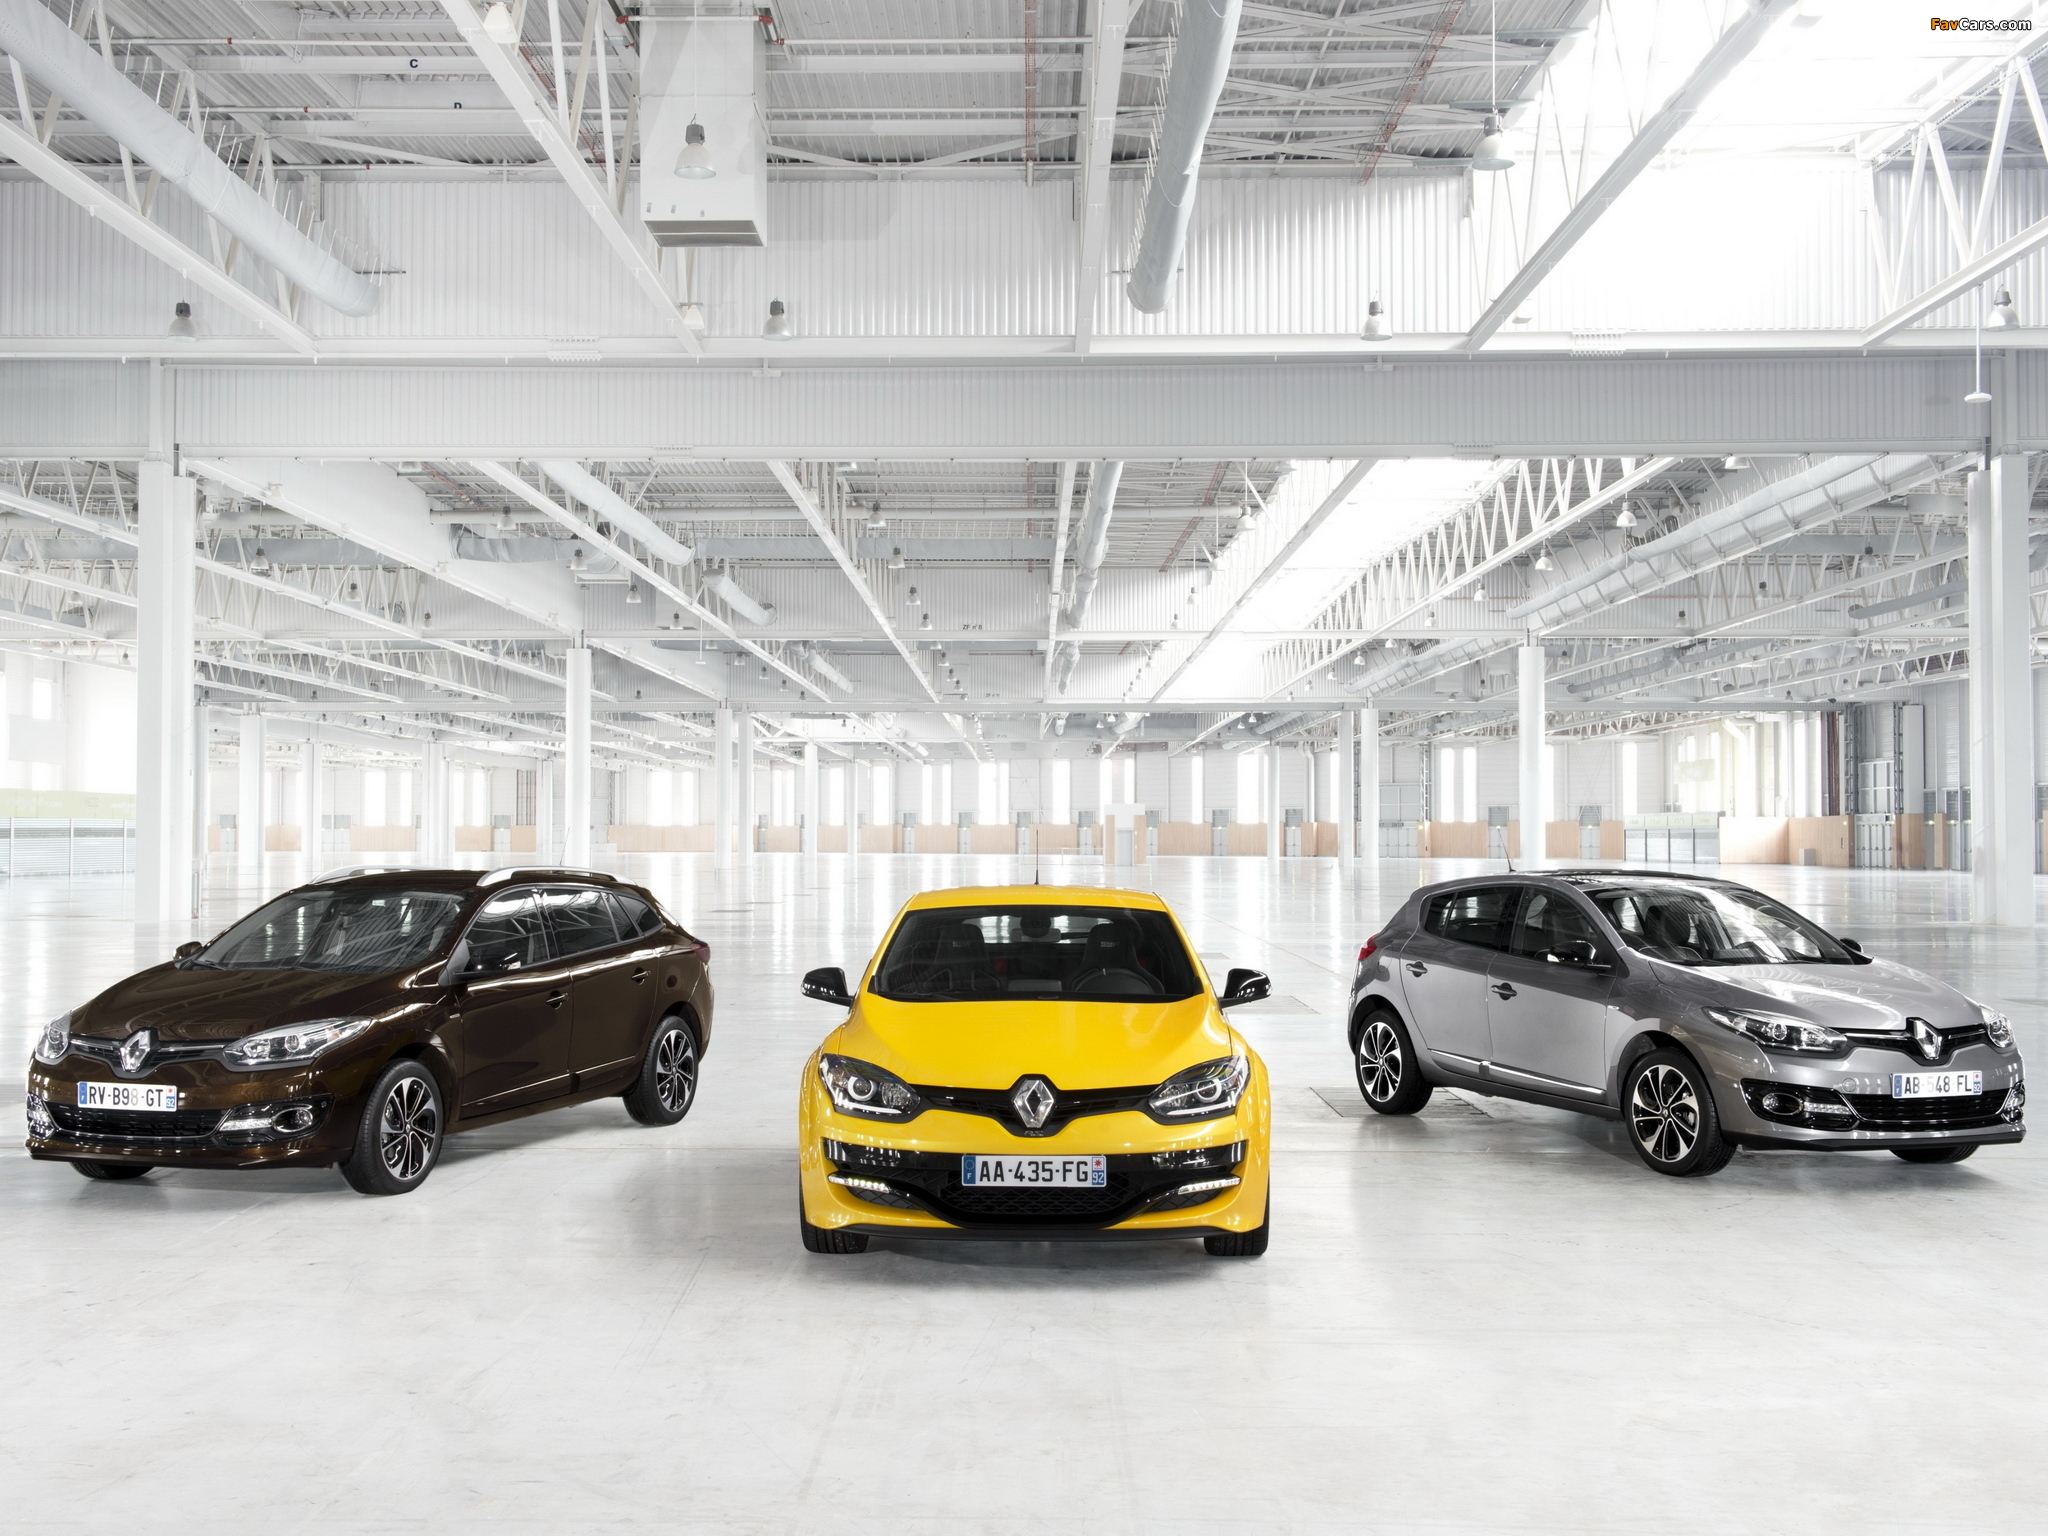 Renault Megane wallpapers (2048 x 1536)